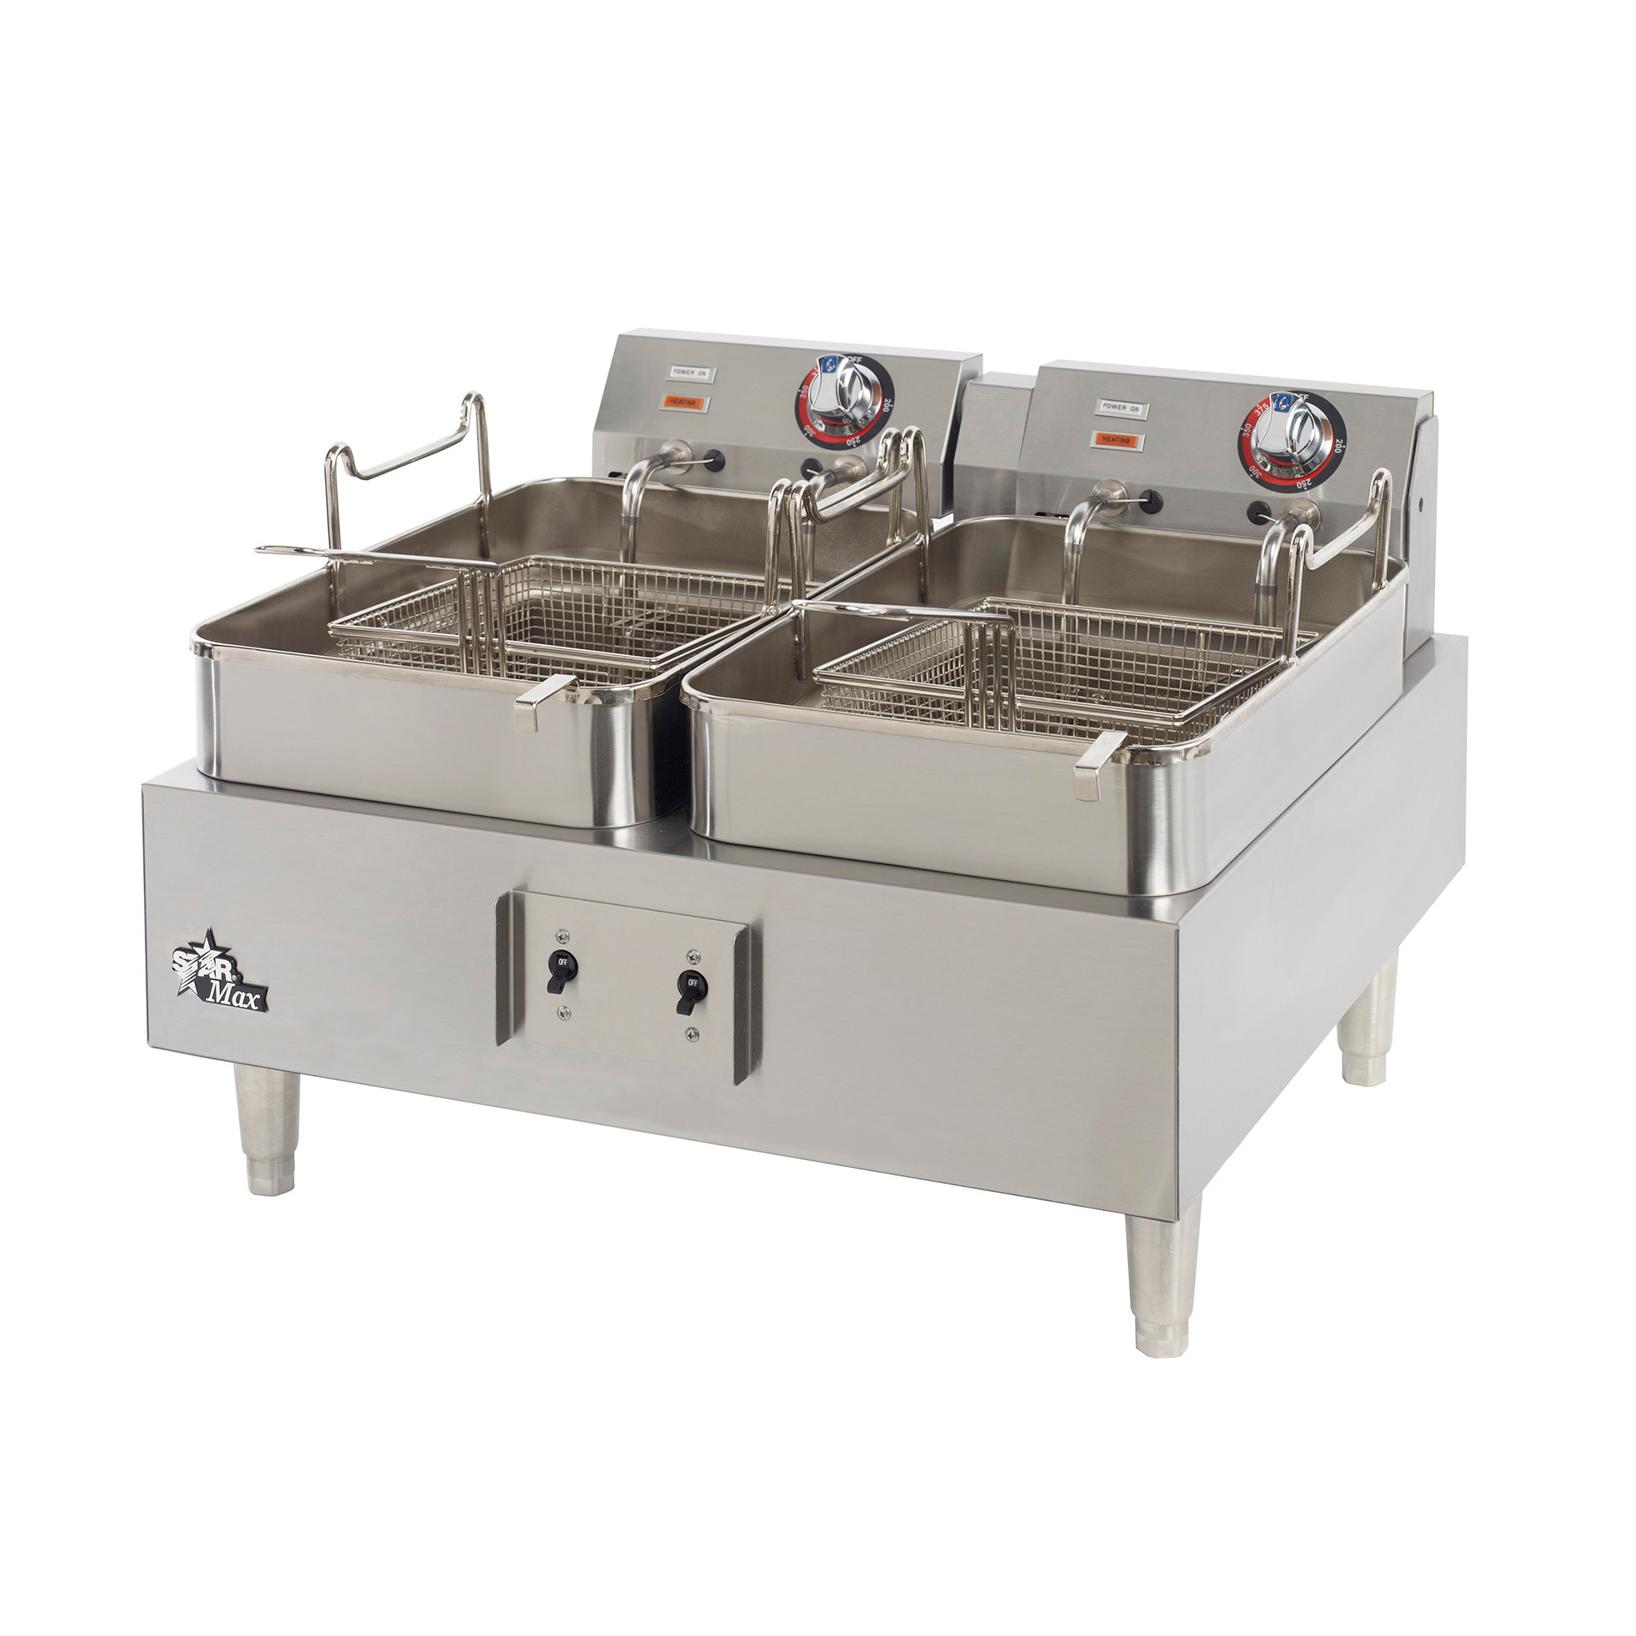 530TF Star fryer, electric, countertop, split pot